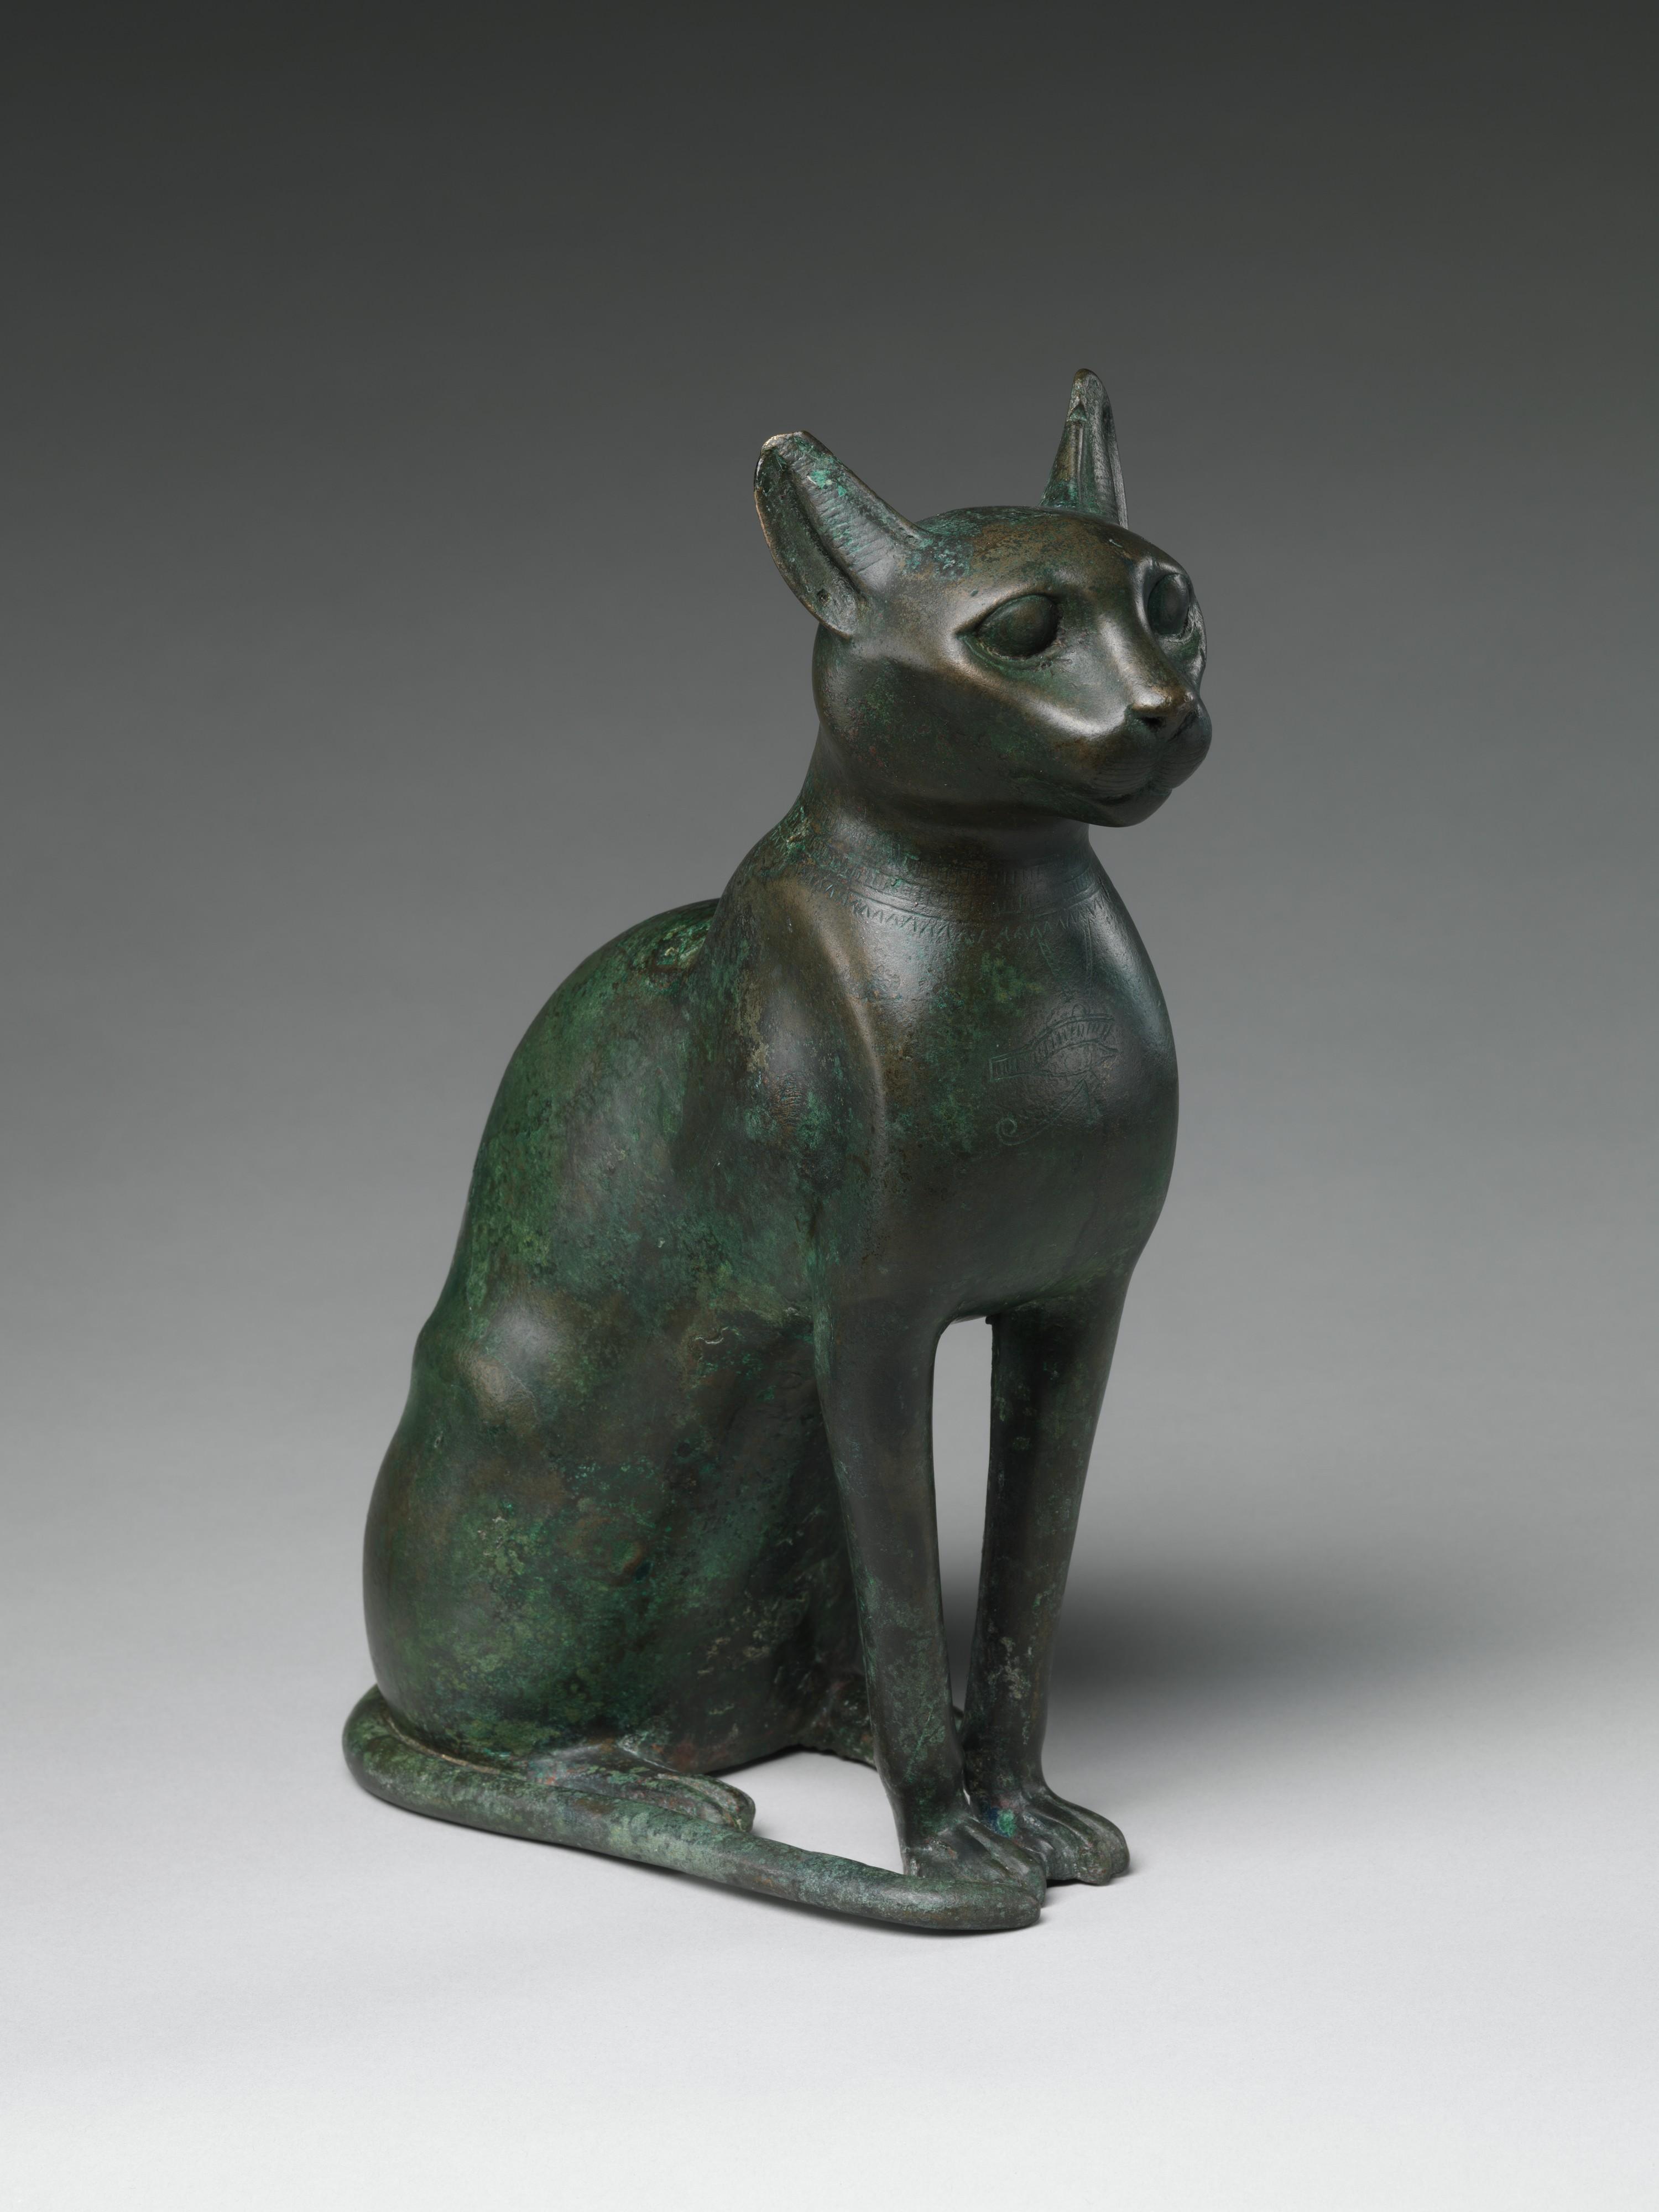 Egyptian, Ptolemaic Period, Cat Statuette, 332–30 B.C. Leaded bronze. The Metropolitan Museum of Art, Harris Brisbane Dick Fund, 1956.